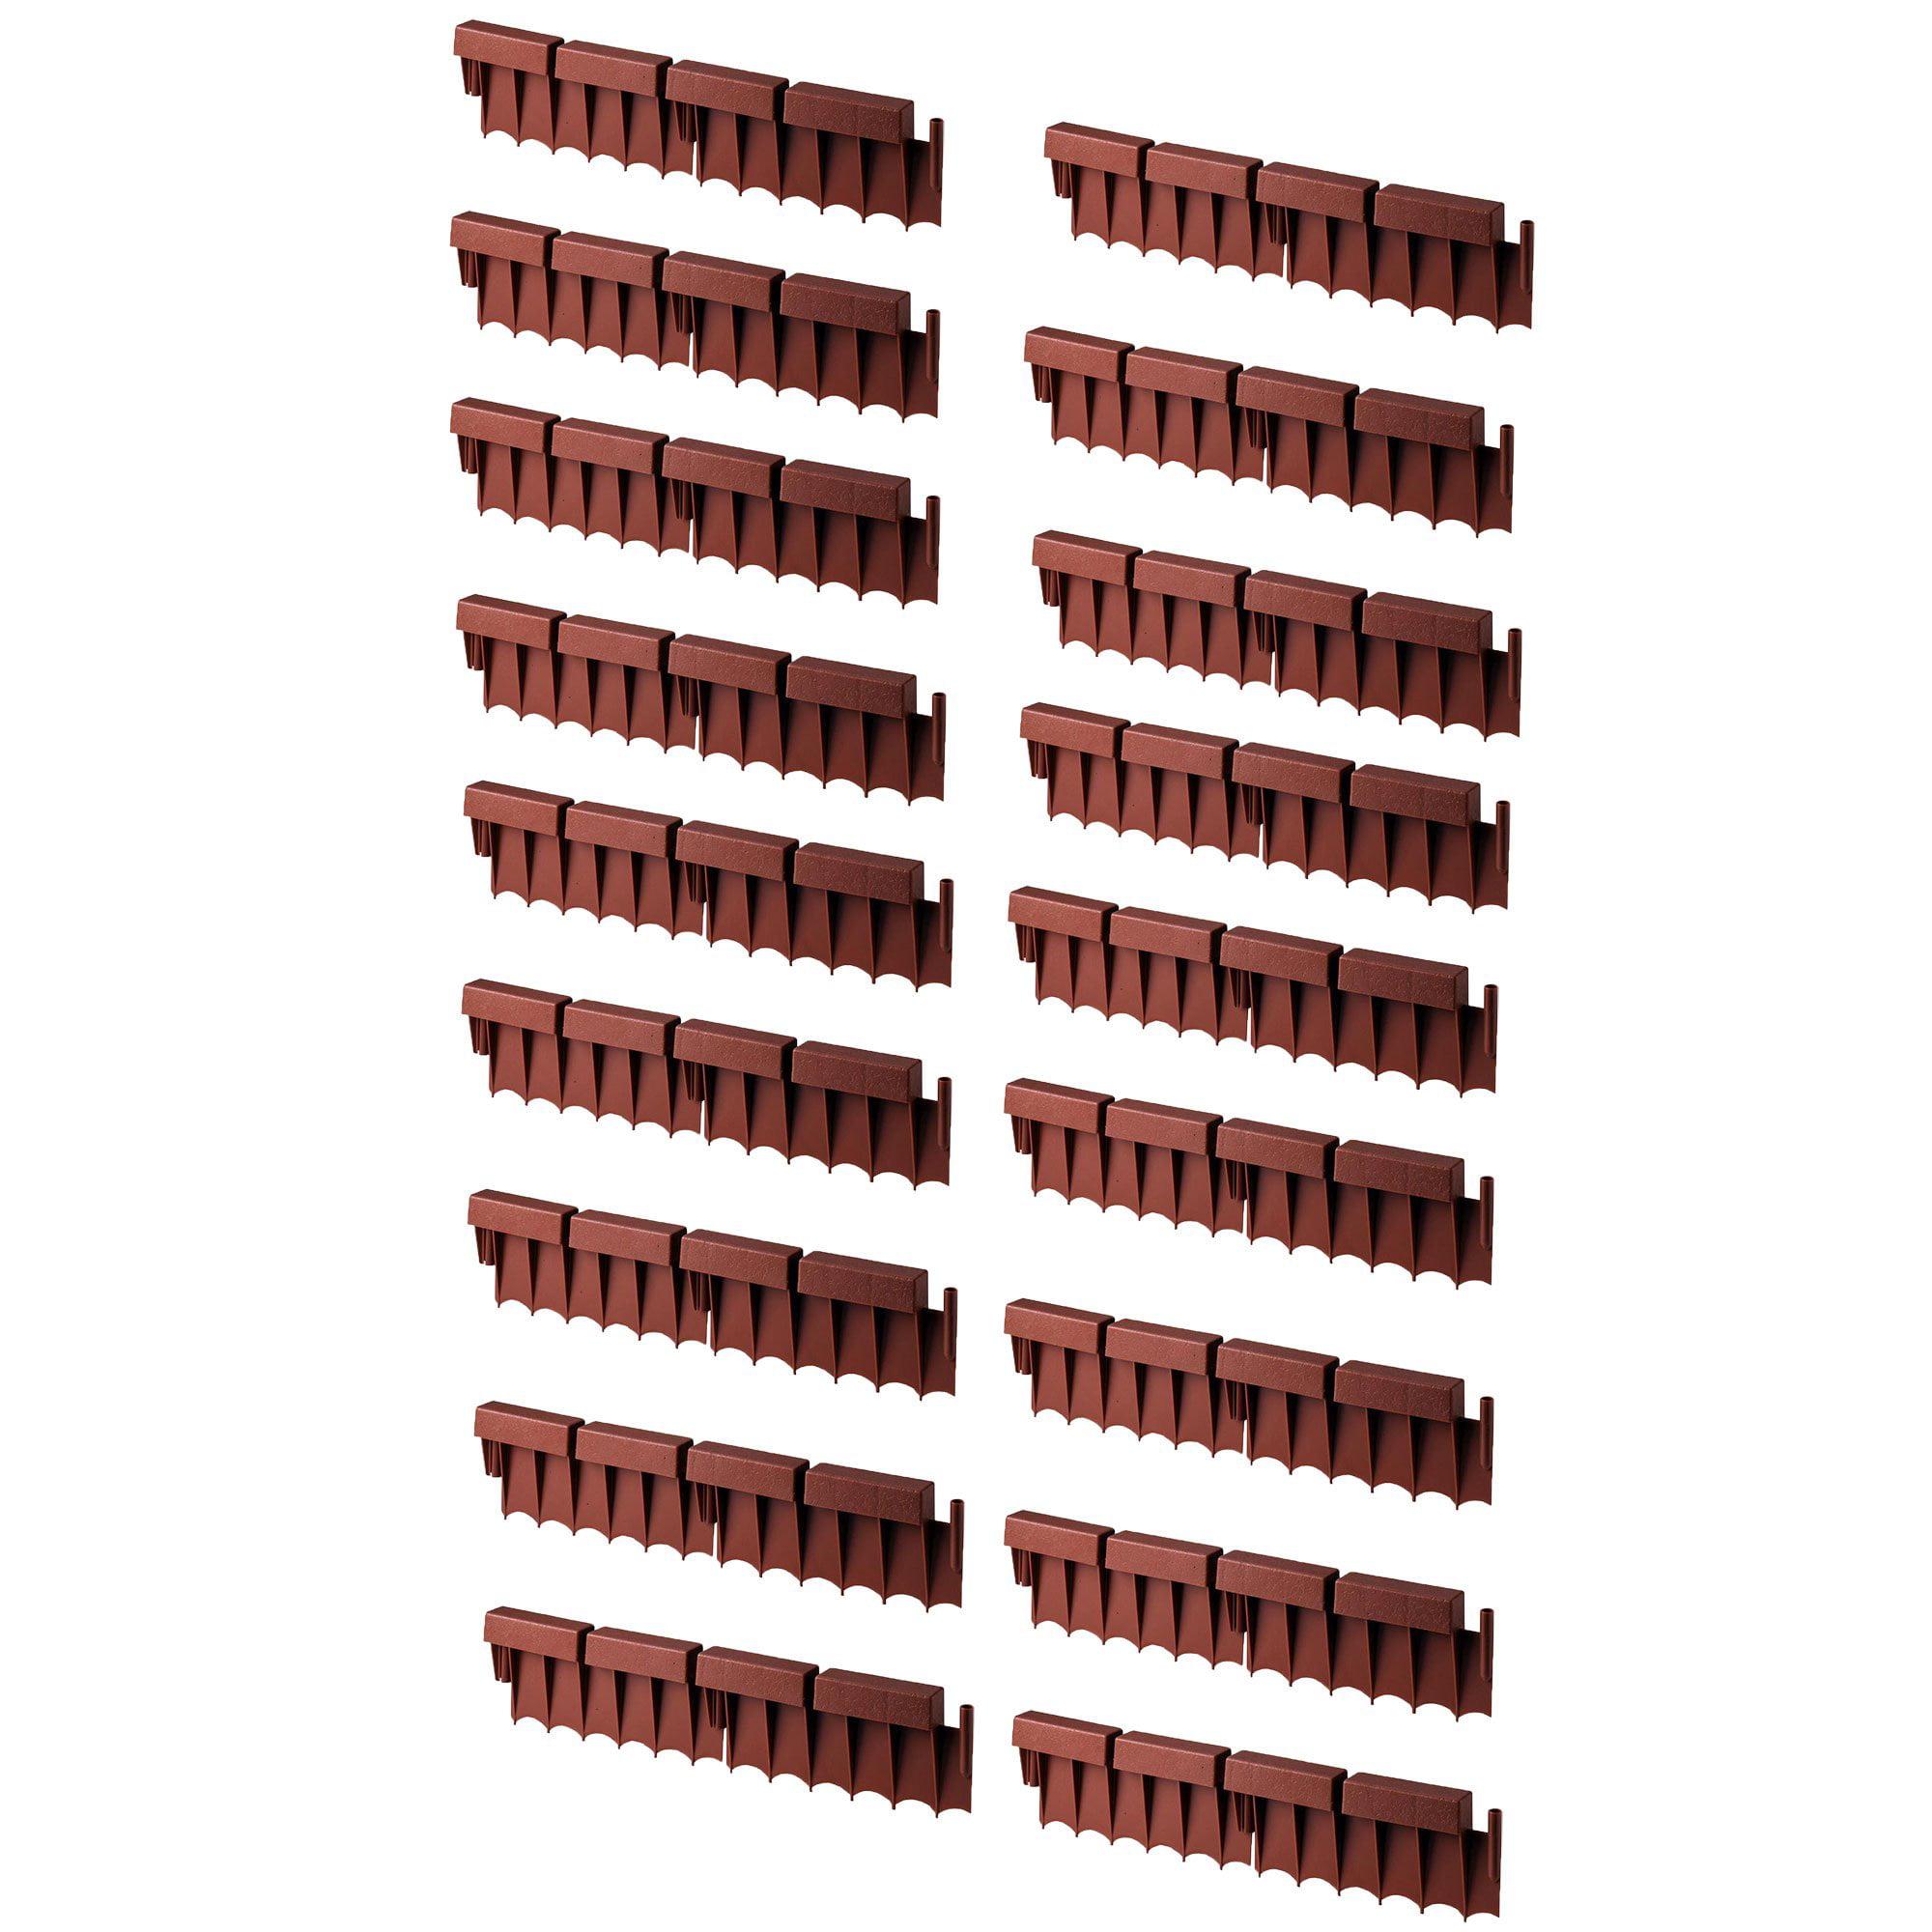 Suncast BBE10TC 10 Ft Interlocking Brick Border Edging, 12 In Section (20 Pack)